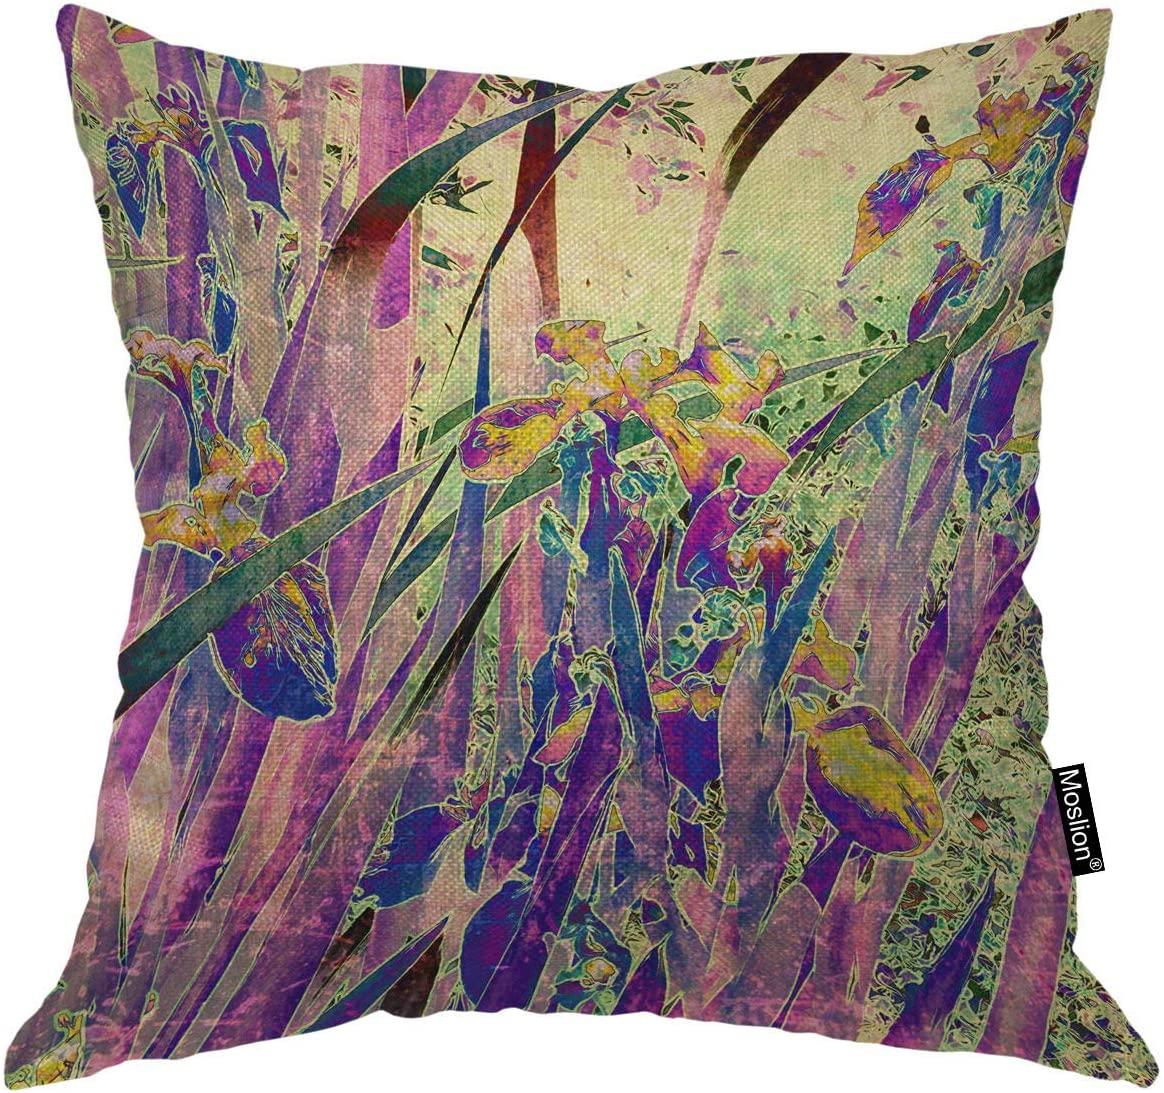 Moslion Floral Pillows Vintage Art Nature Irises Flower Leaves Throw Pillow Cover Decorative Pillow Case Square Cushion Accent Cotton Linen Home 18x18 Inch Purple Green